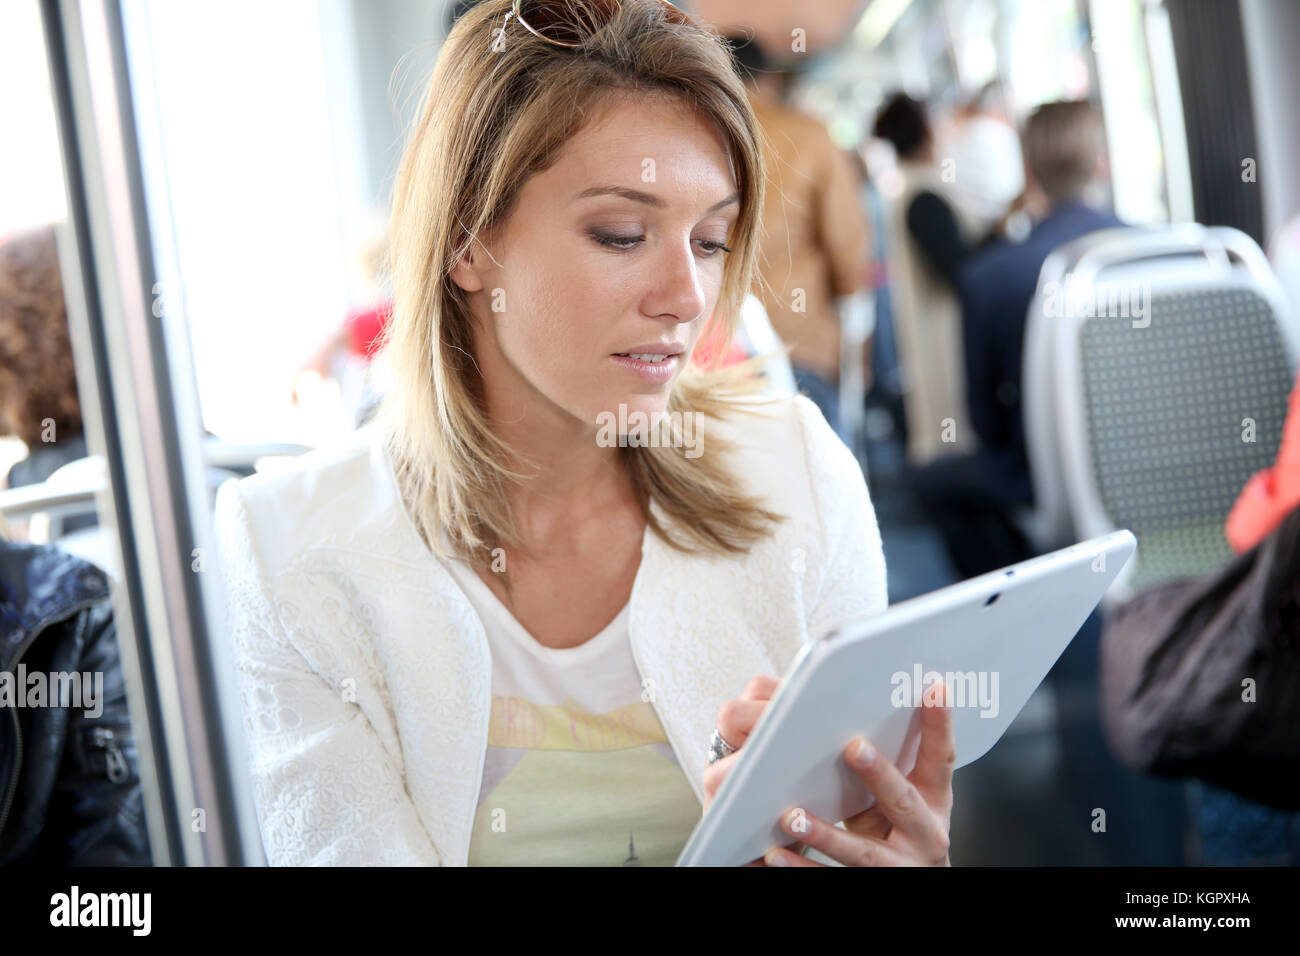 Mujer en tren ciudad websurfing con tablet Imagen De Stock